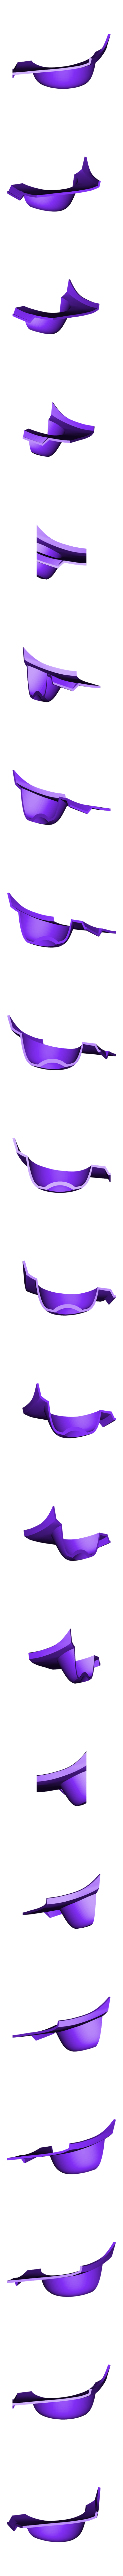 Part_13_v3.stl Download free STL file Blood Dragon Helmet Mass Effect 2 • Design to 3D print, VillainousPropShop